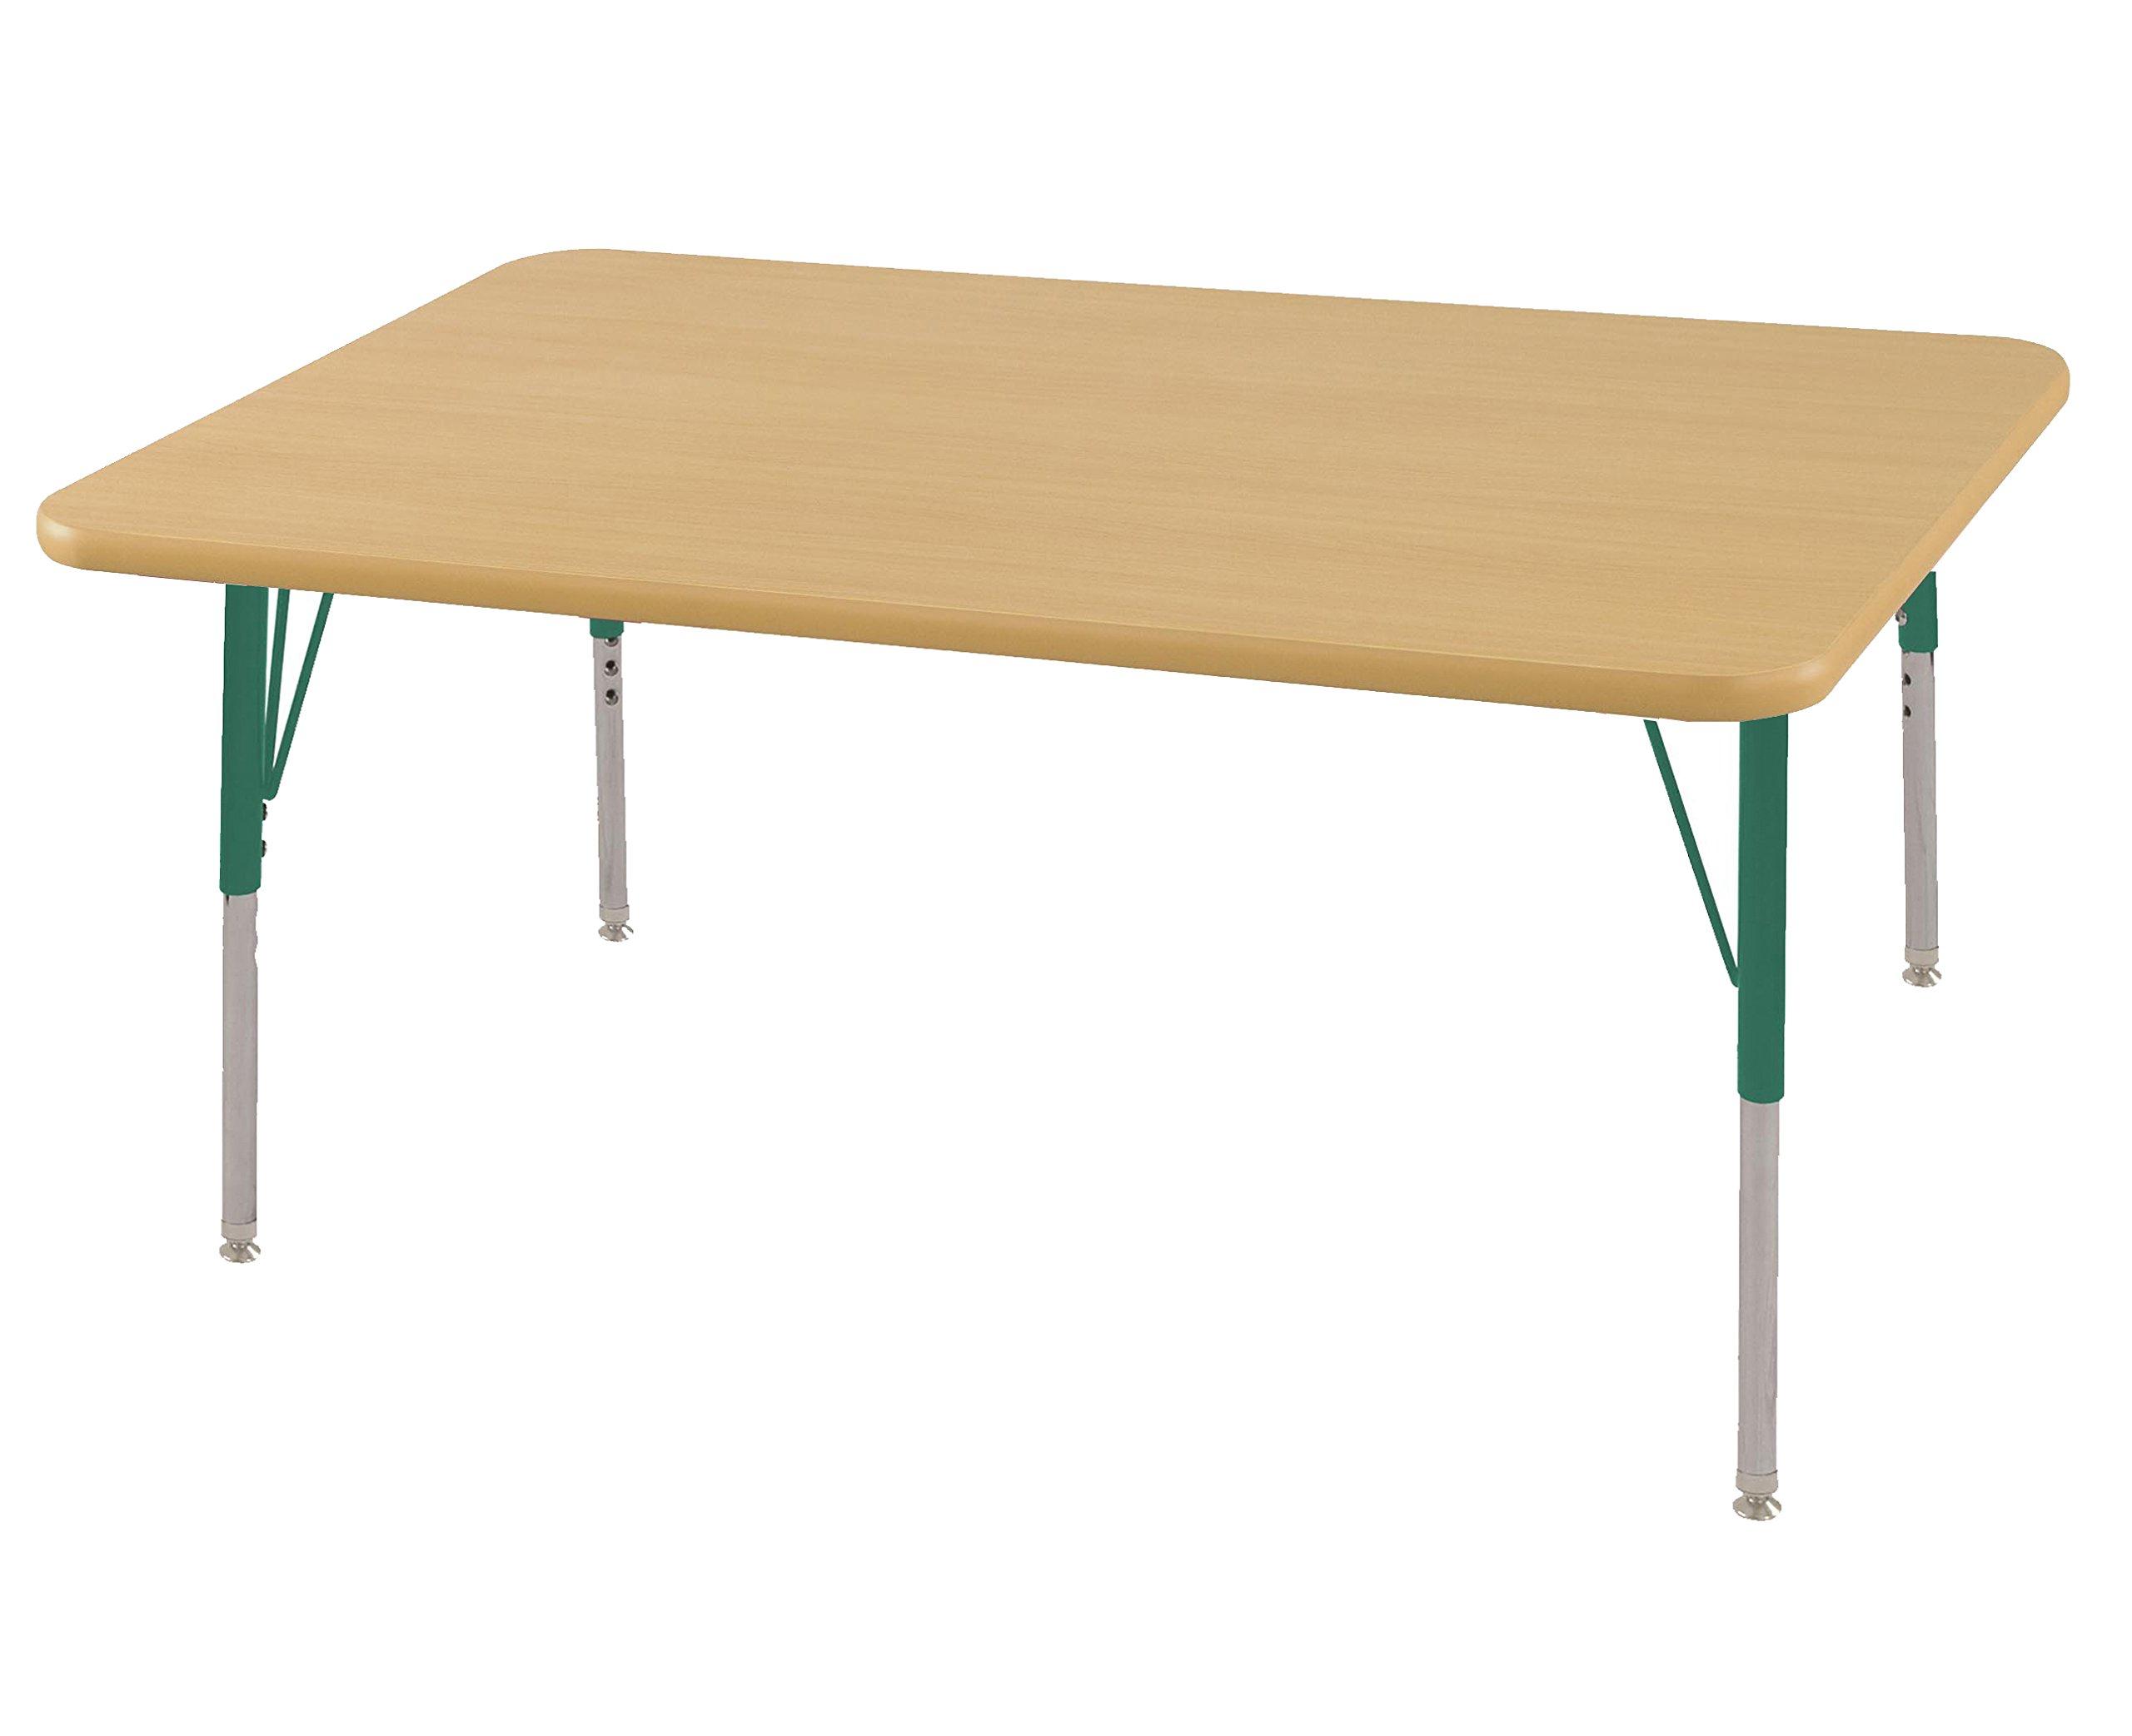 ECR4Kids Mesa T-Mold 30'' x 48'' Rectangular School Activity Table, Standard Legs w/ Swivel Glides, Adjustable Height 19-30 inch (Maple/Green)